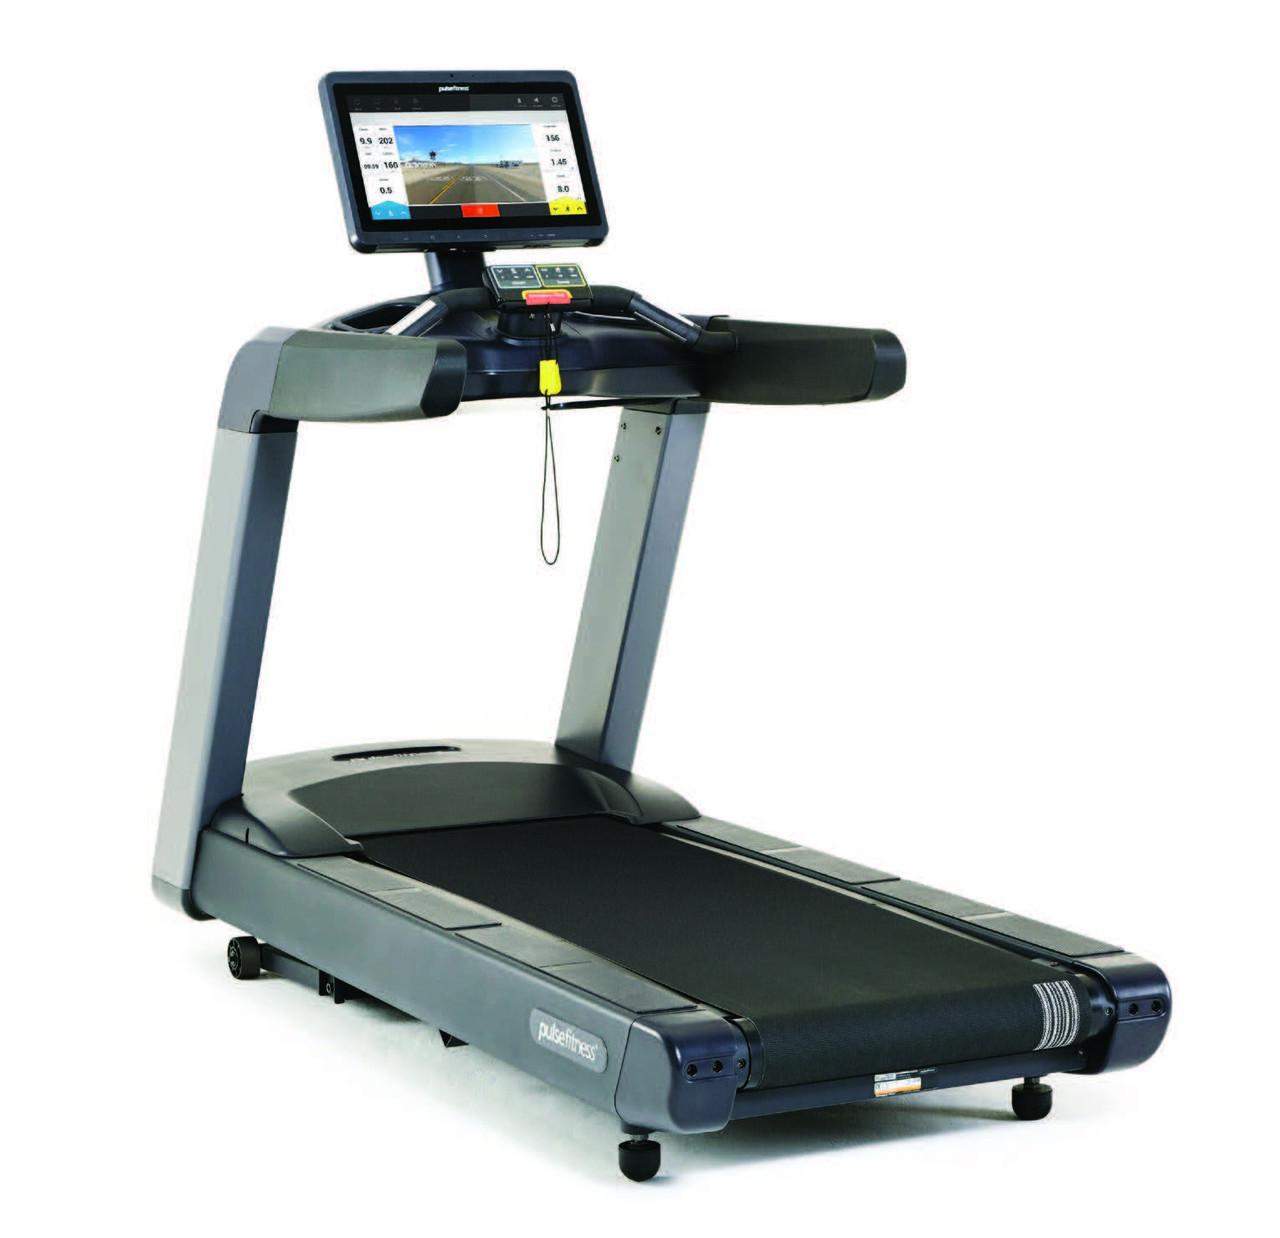 Pulse Fitness Fusion Run Treadmill Series 3 Stealth - New